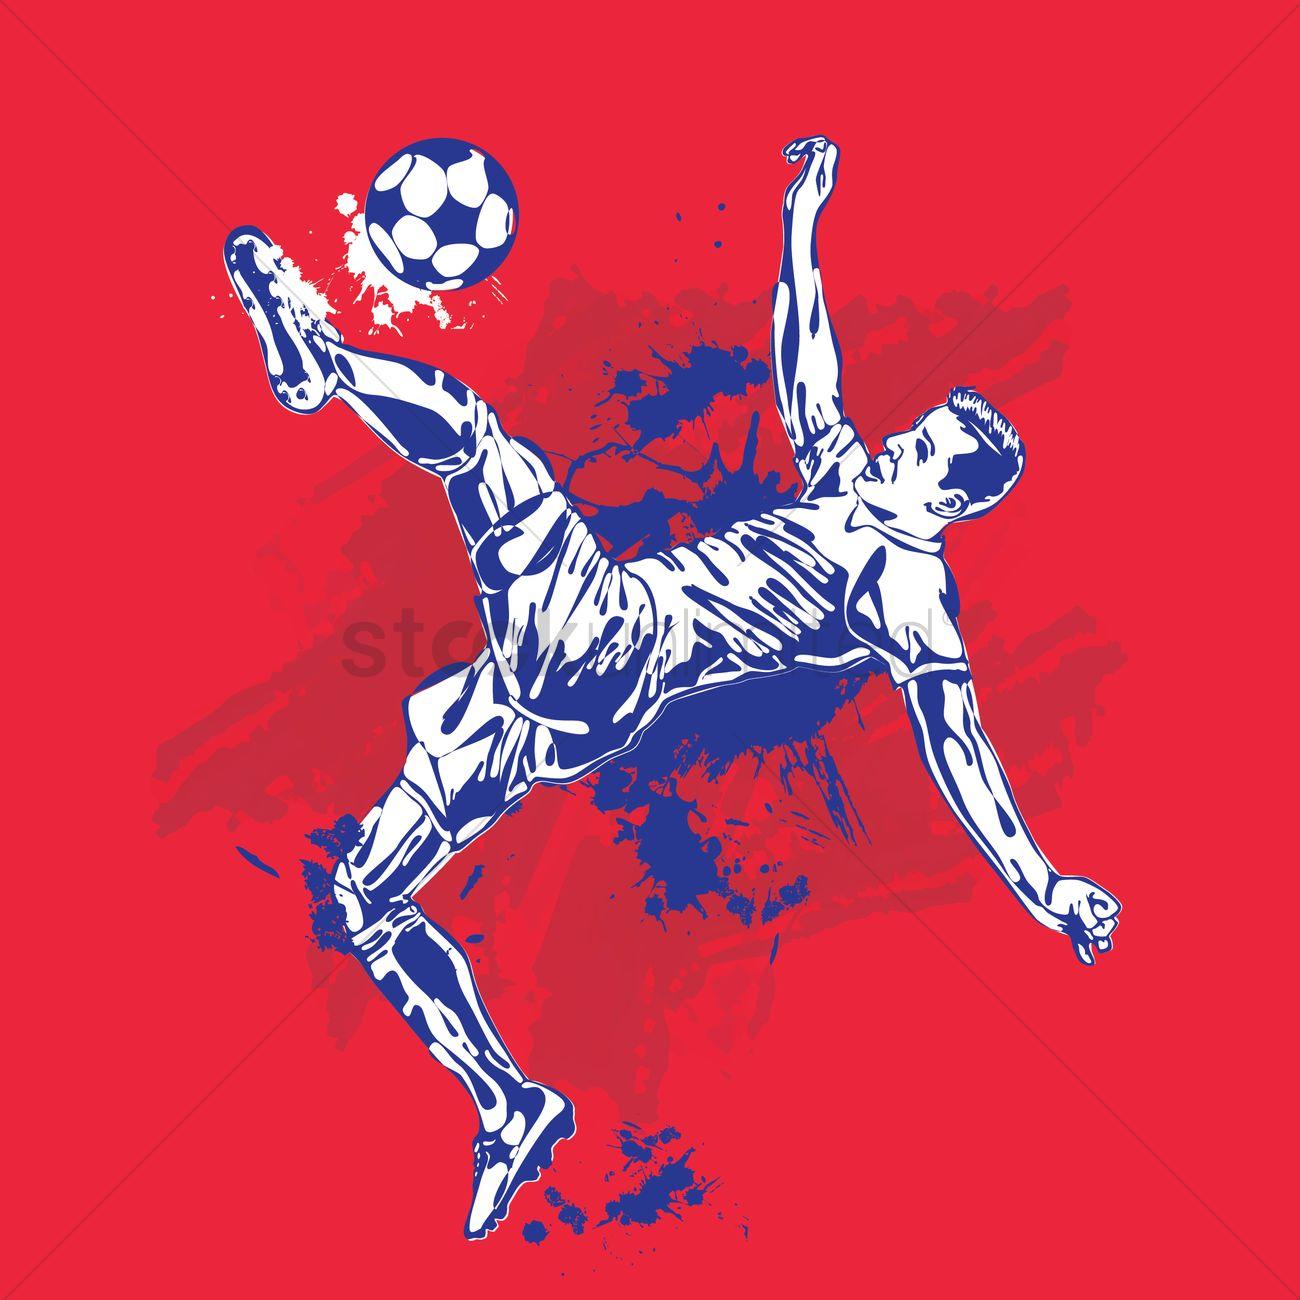 Soccer Wallpaper Vector Image 1817518 Stockunlimited